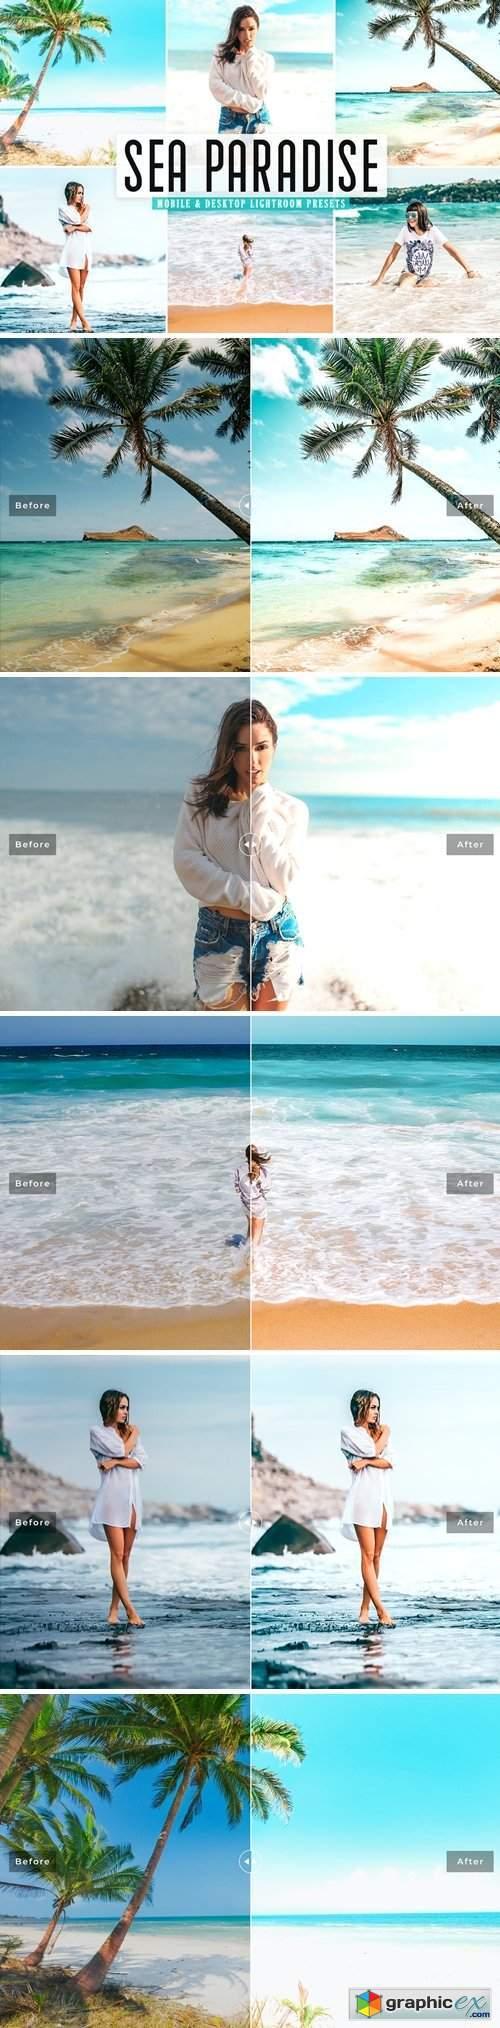 Sea Paradise Mobile & Desktop Lightroom Presets